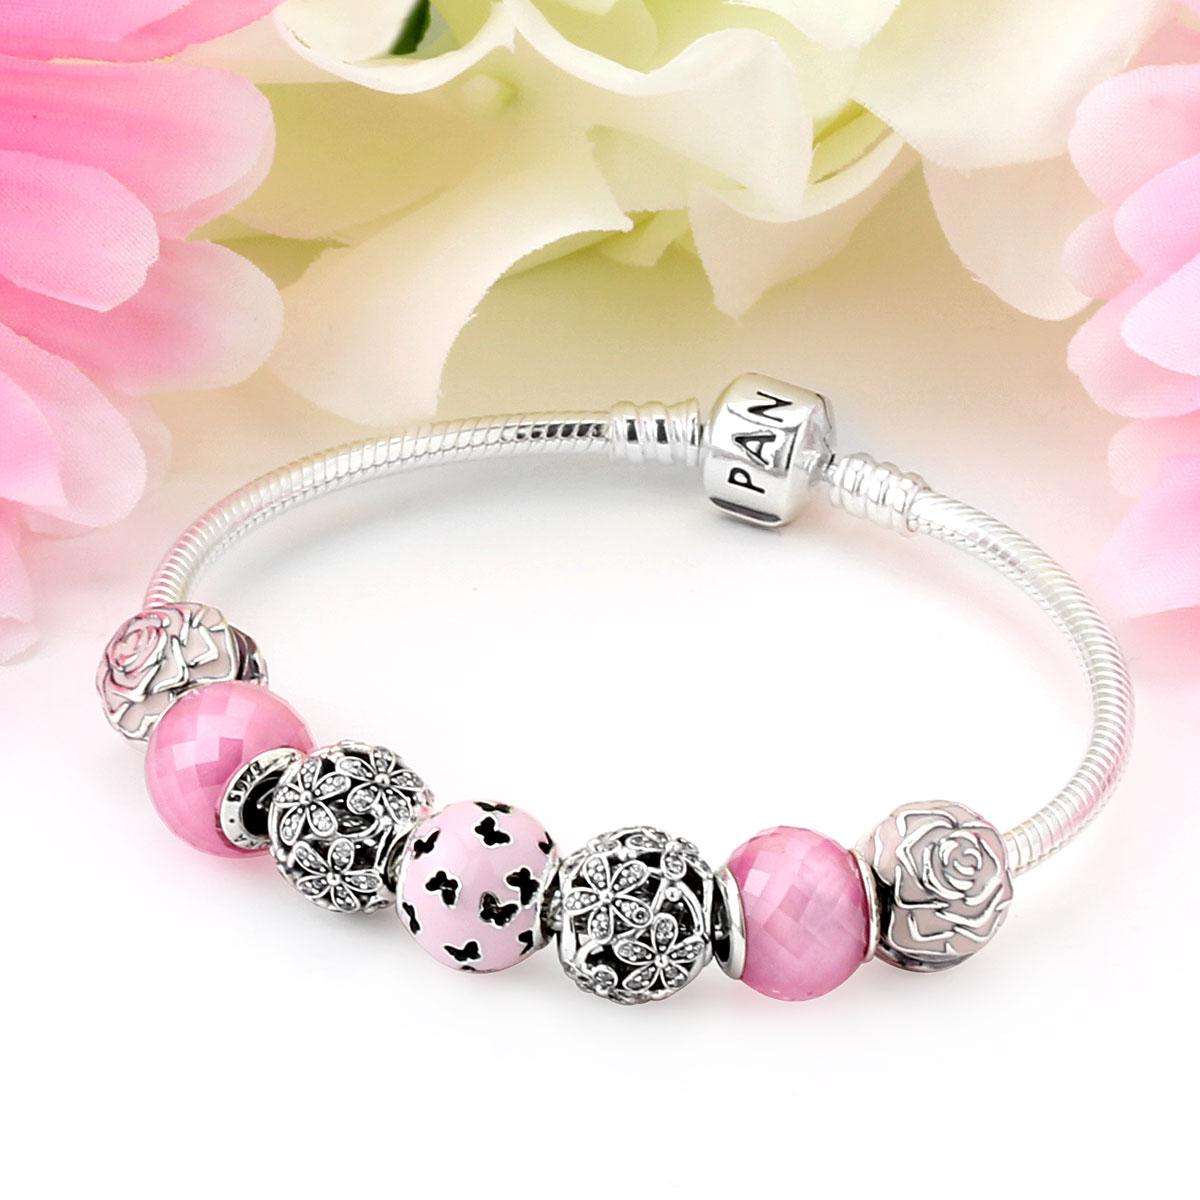 Pandora Bracelet Design Ideas 199 pandora charm bracelet hot sale Pandora Designer Bracelets